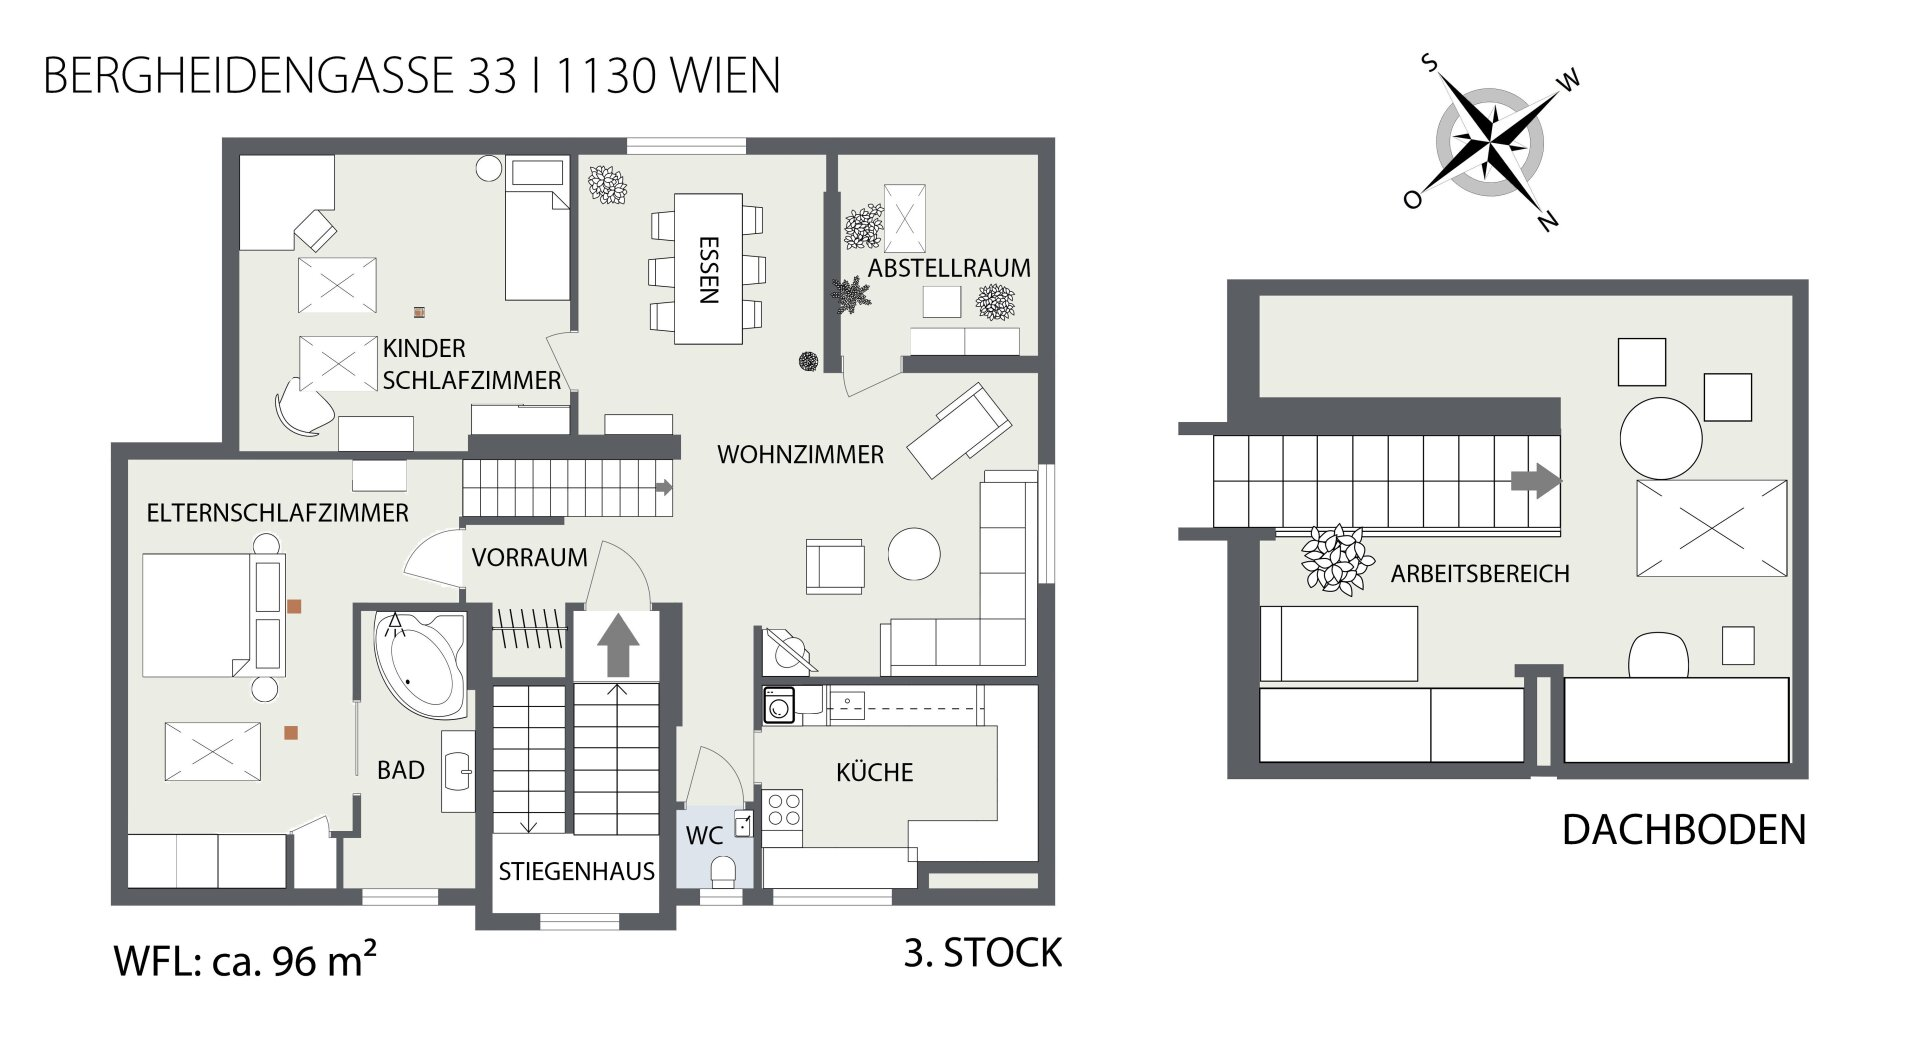 2D Wohnungsplan 3. Stock + Dachboden